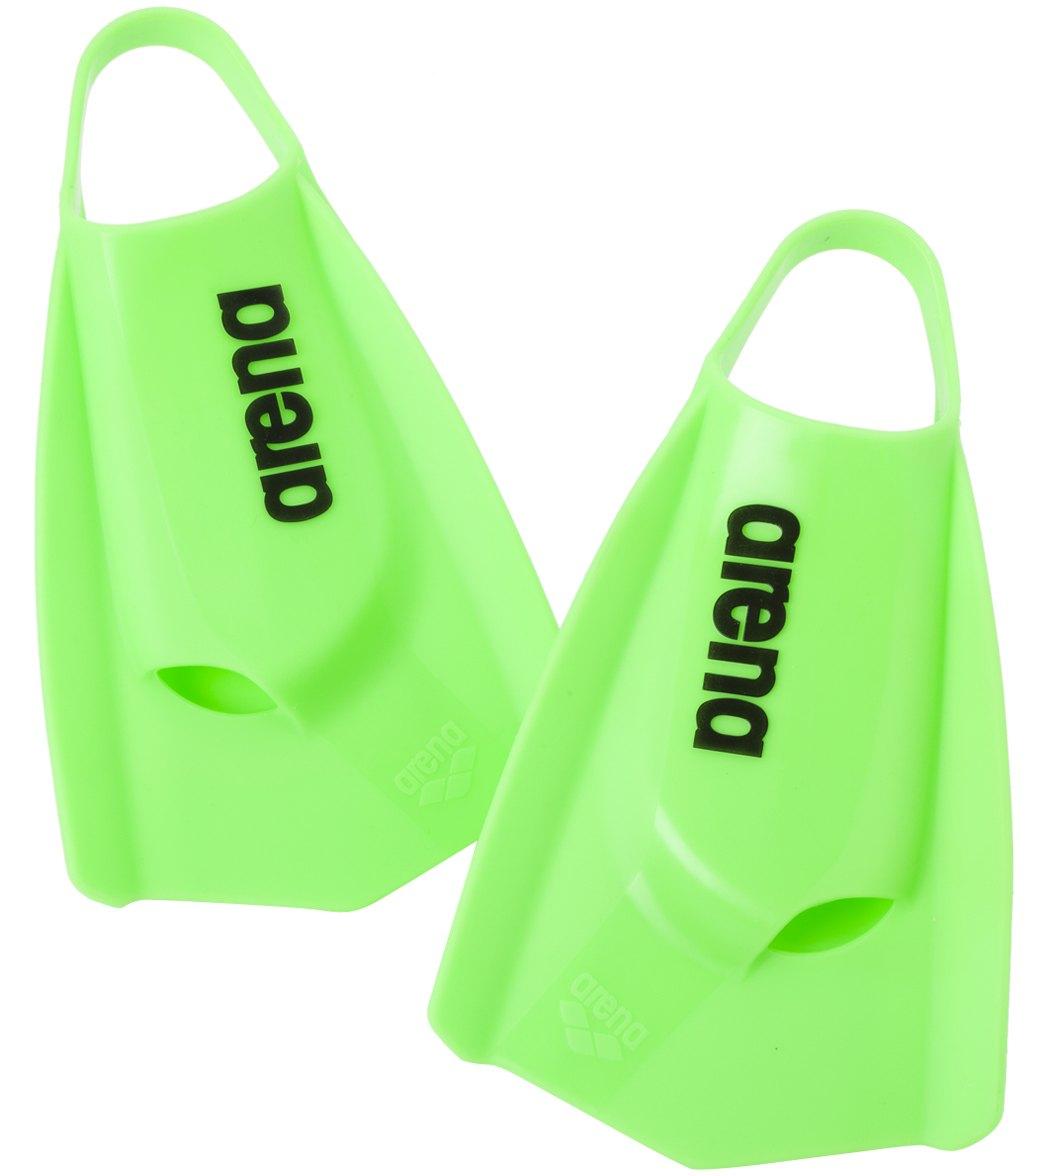 Arena Powerfin Pro Swimming Training Fins